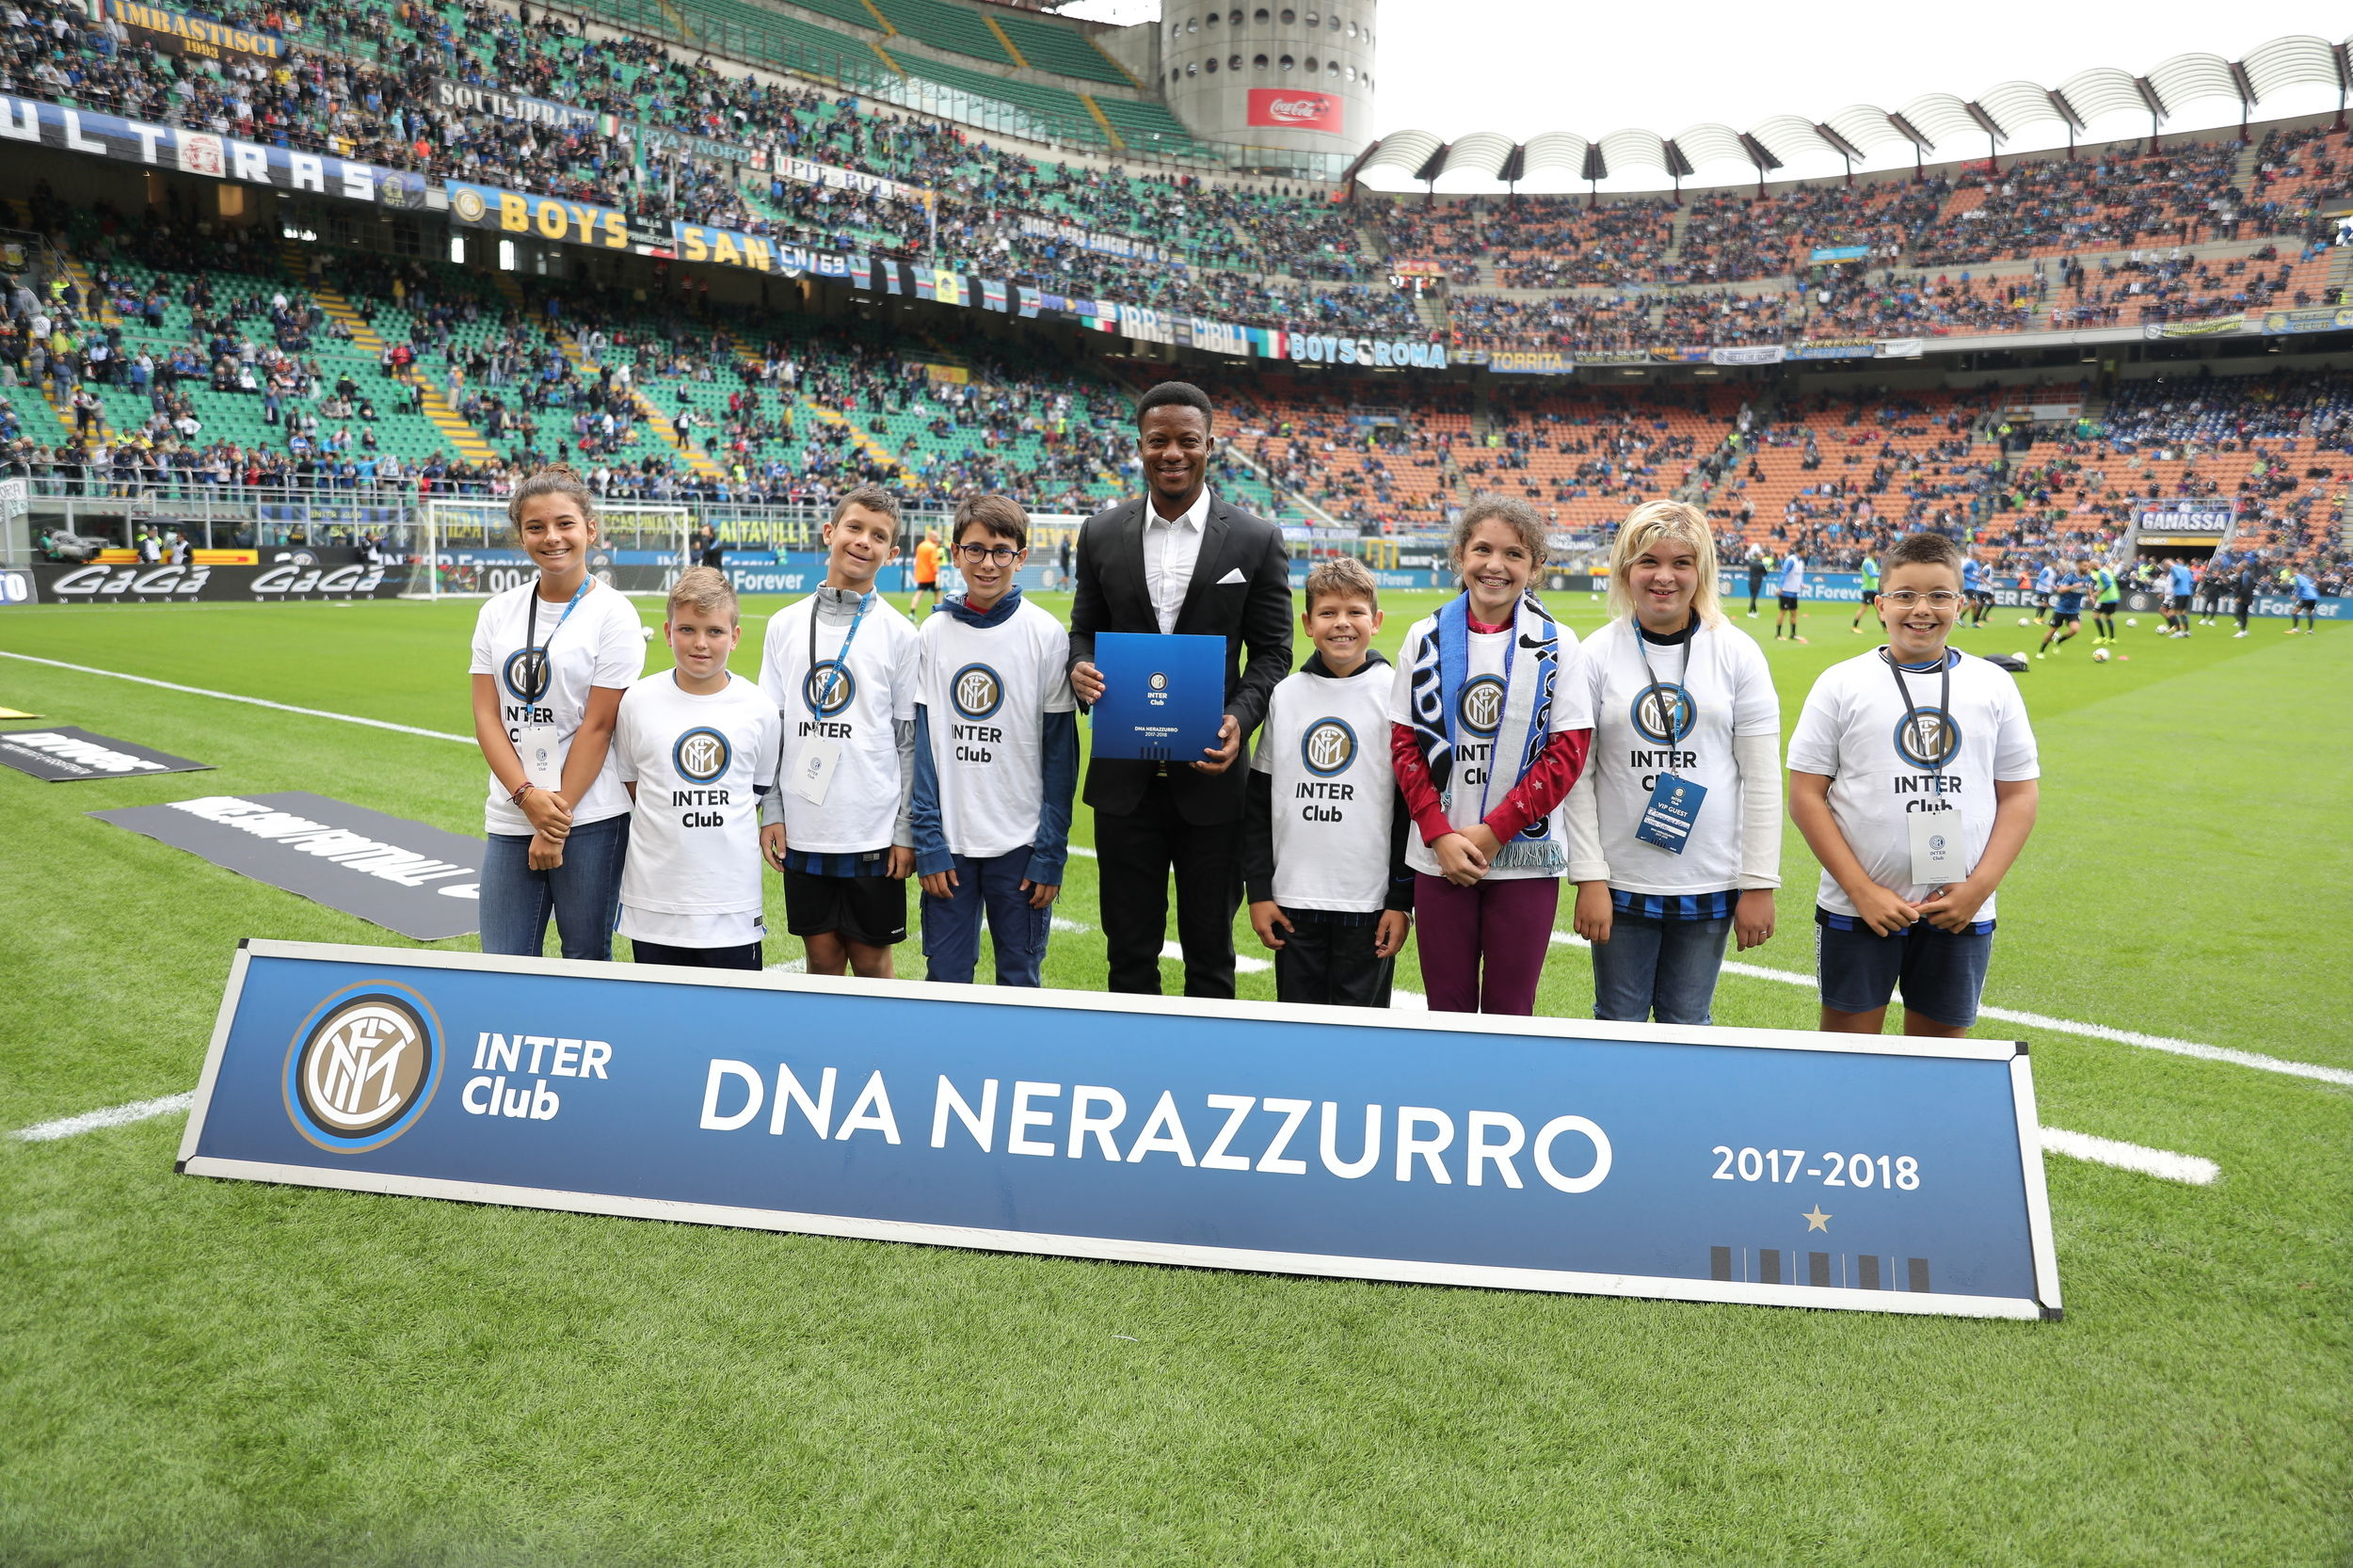 Kallon premia gli Inter Club a San Siro